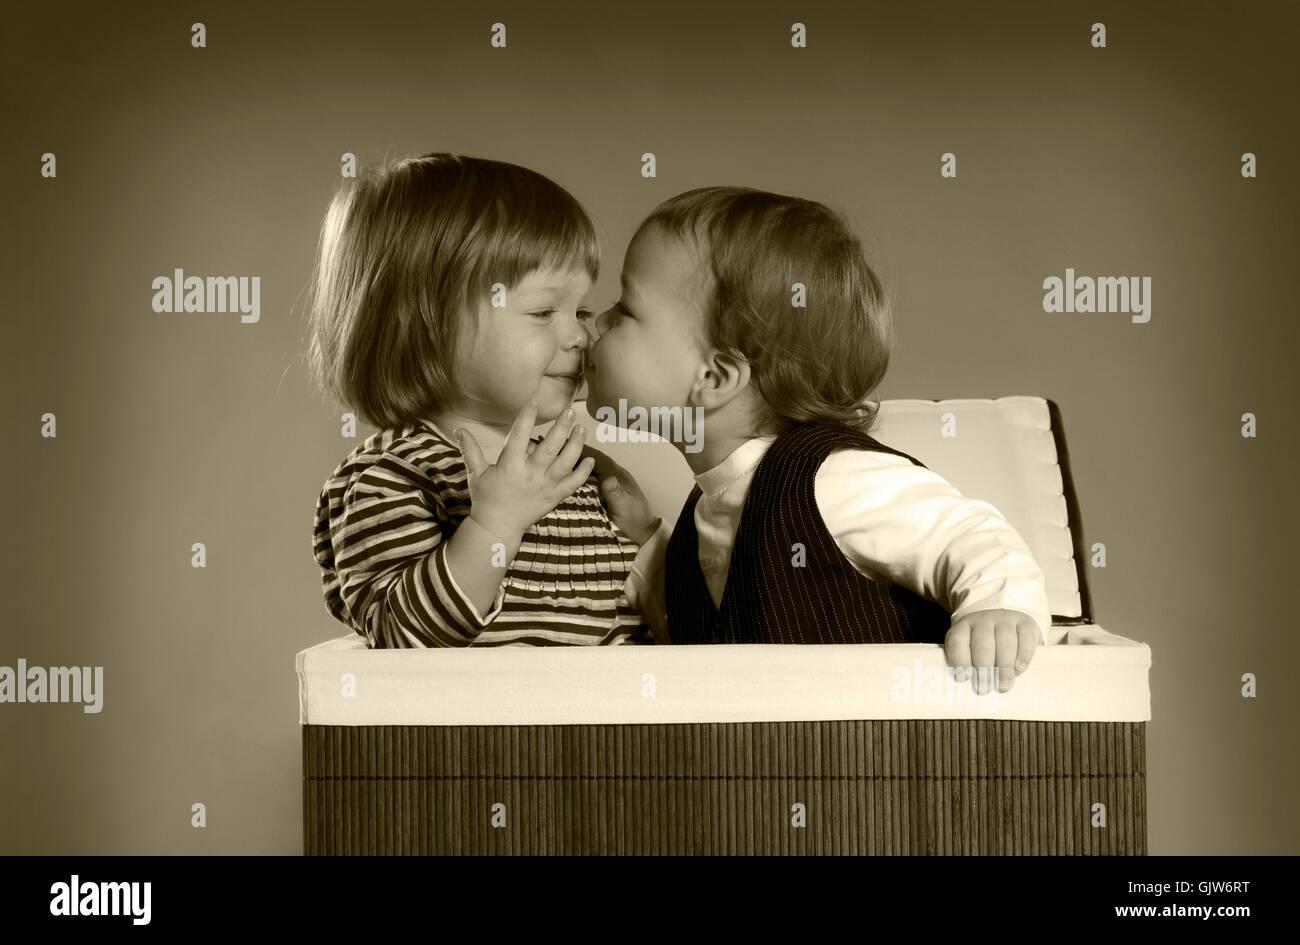 romantic endearing kiss - Stock Image